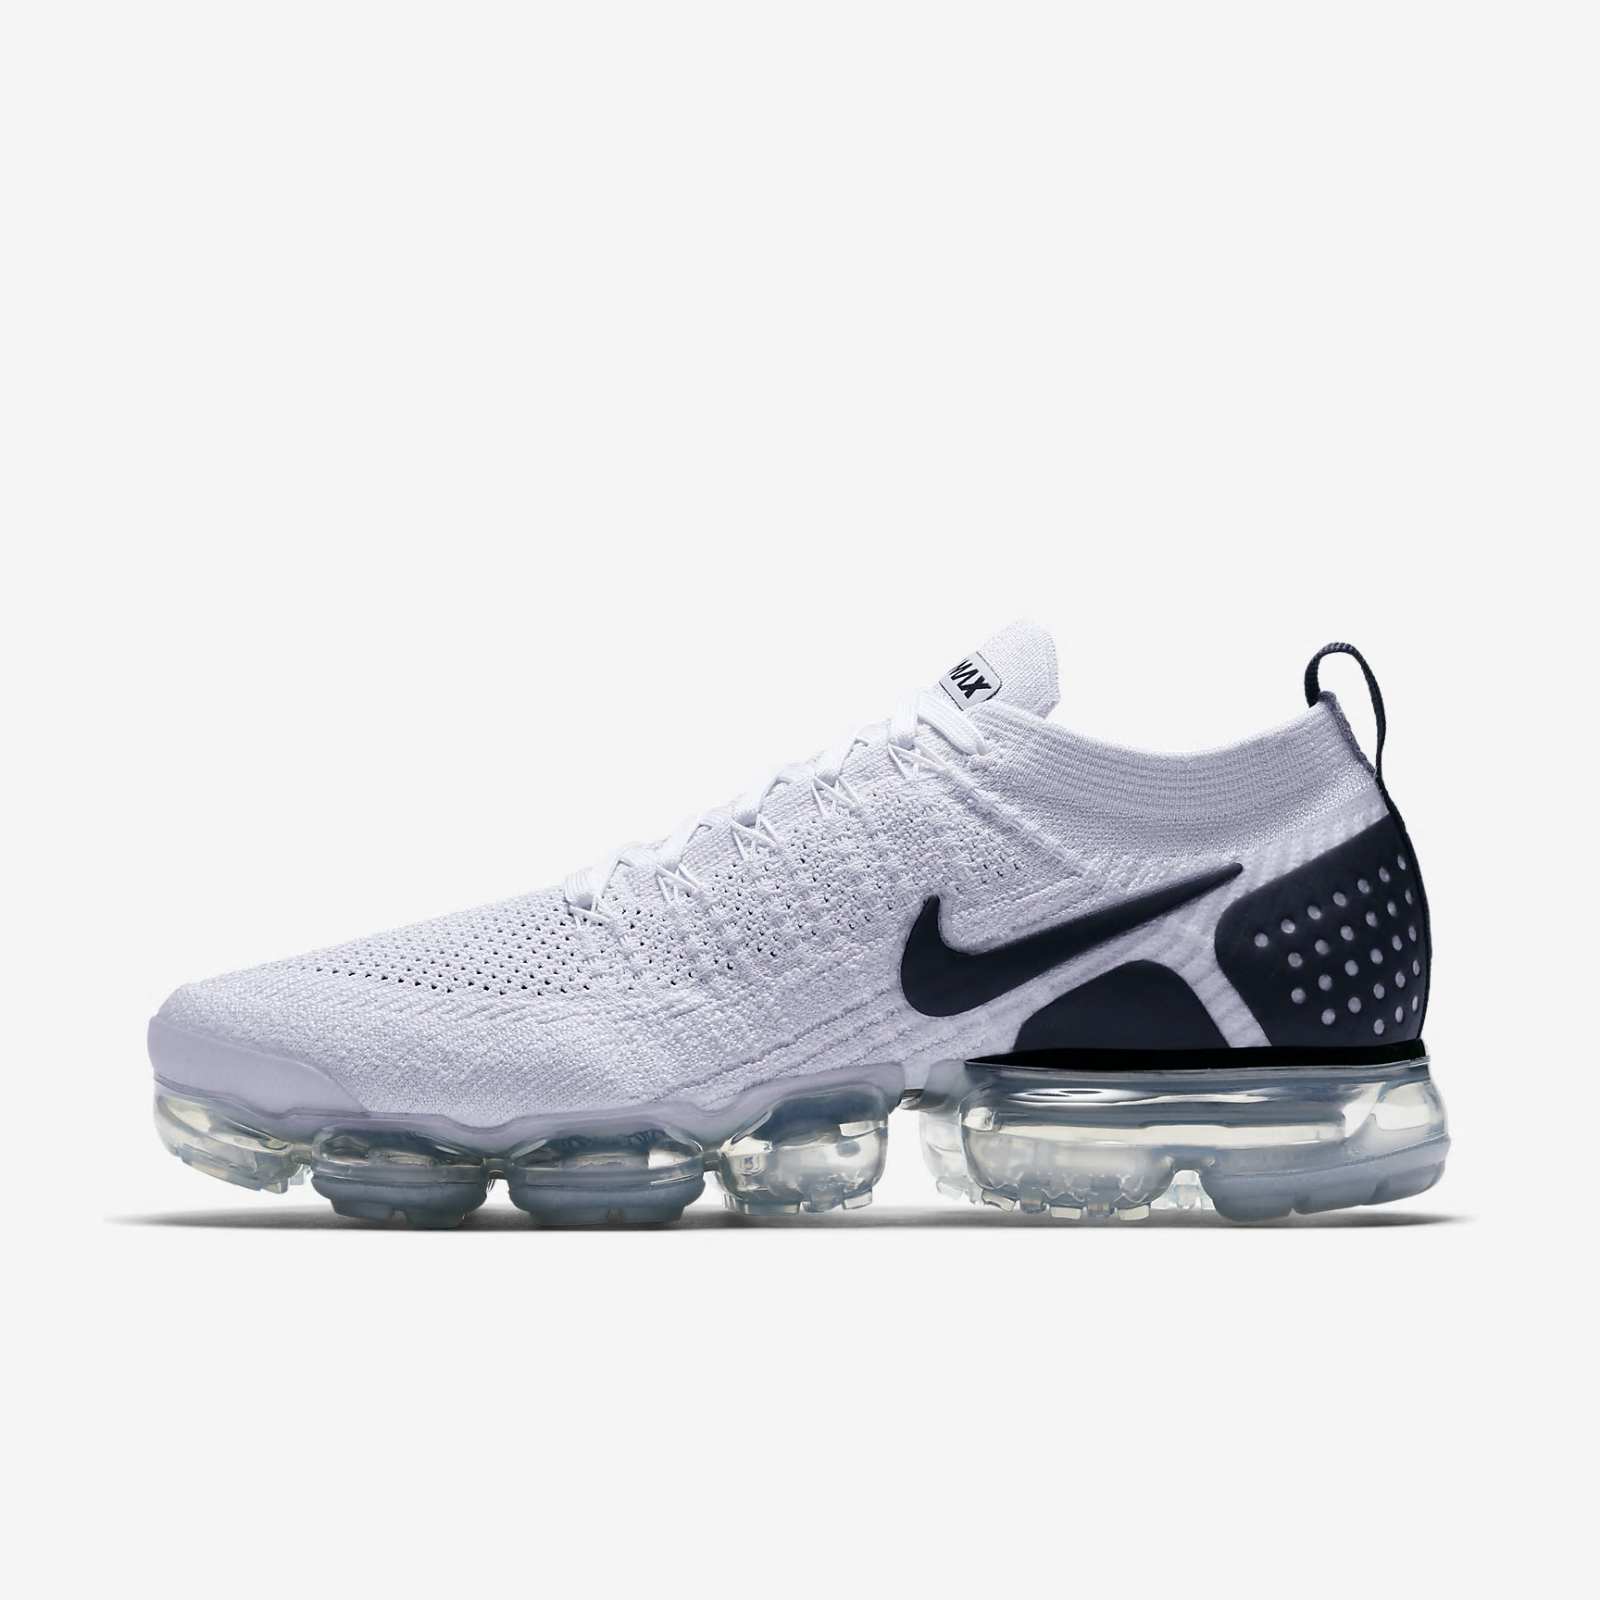 Men's Nike zoom KD 9 brand new size 10.5. 110.99 OBO Free shipping!